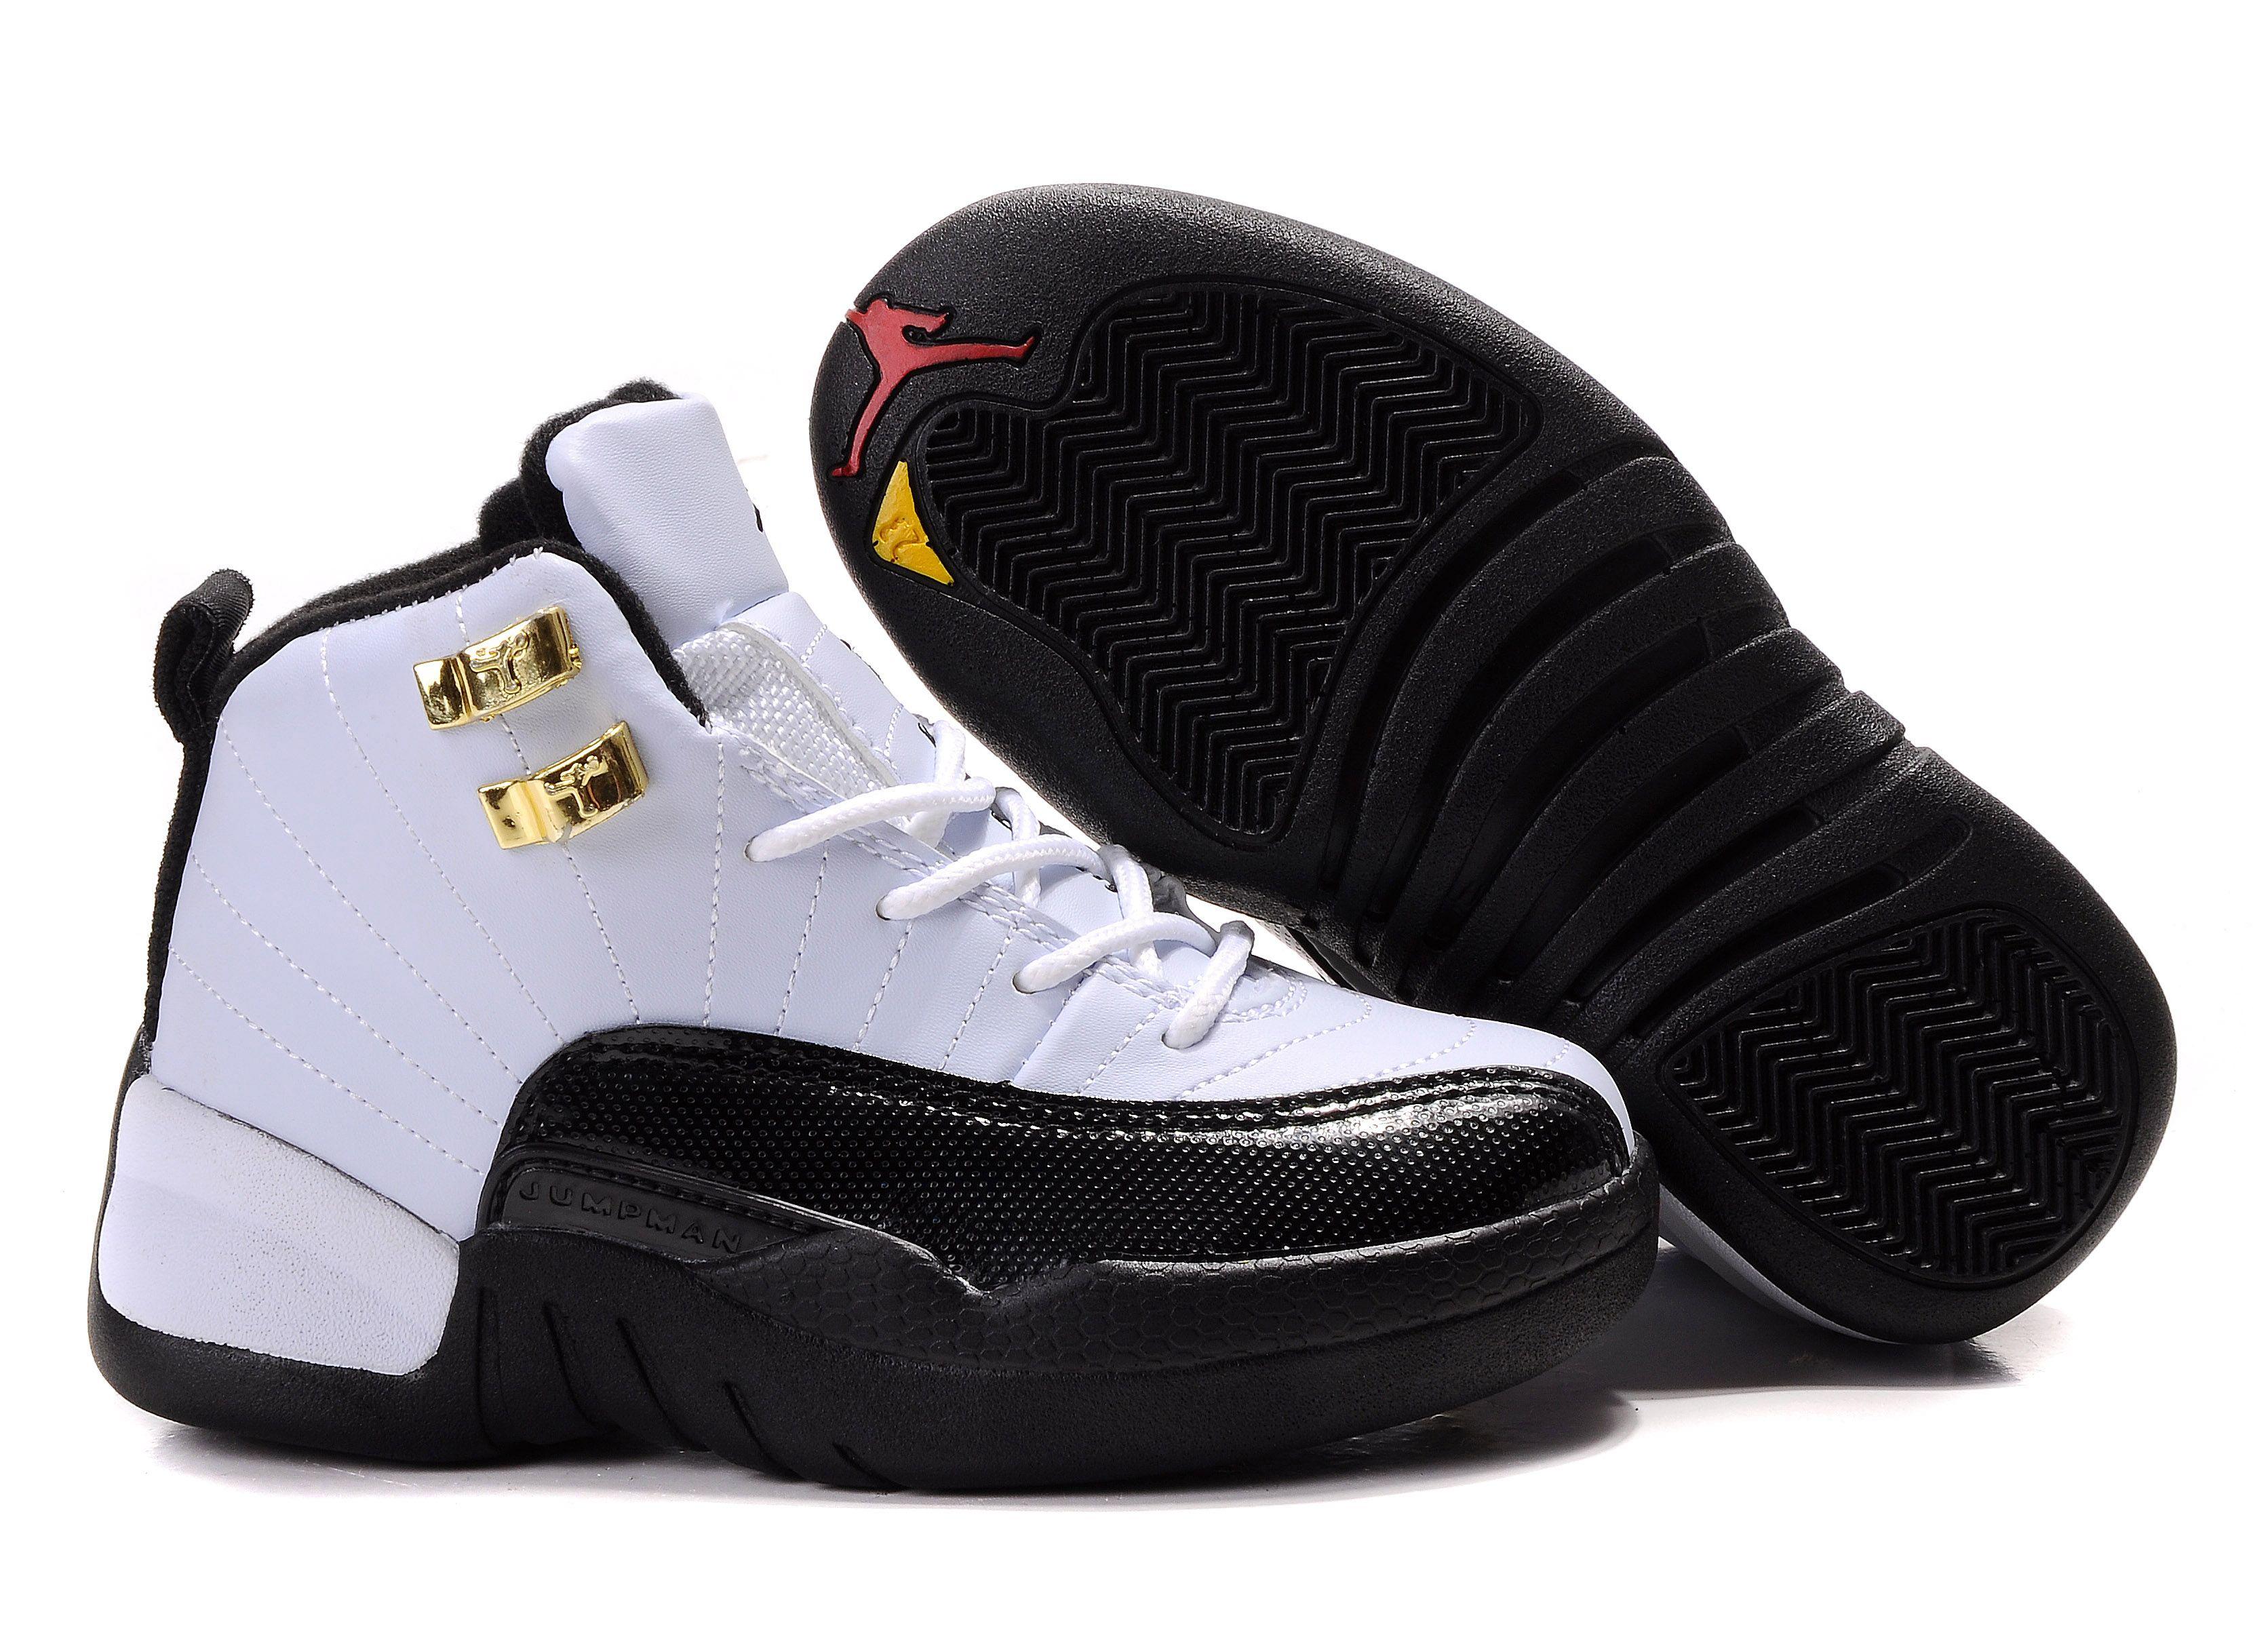 Nike Shoes online,Cheap Kids Air Jordan